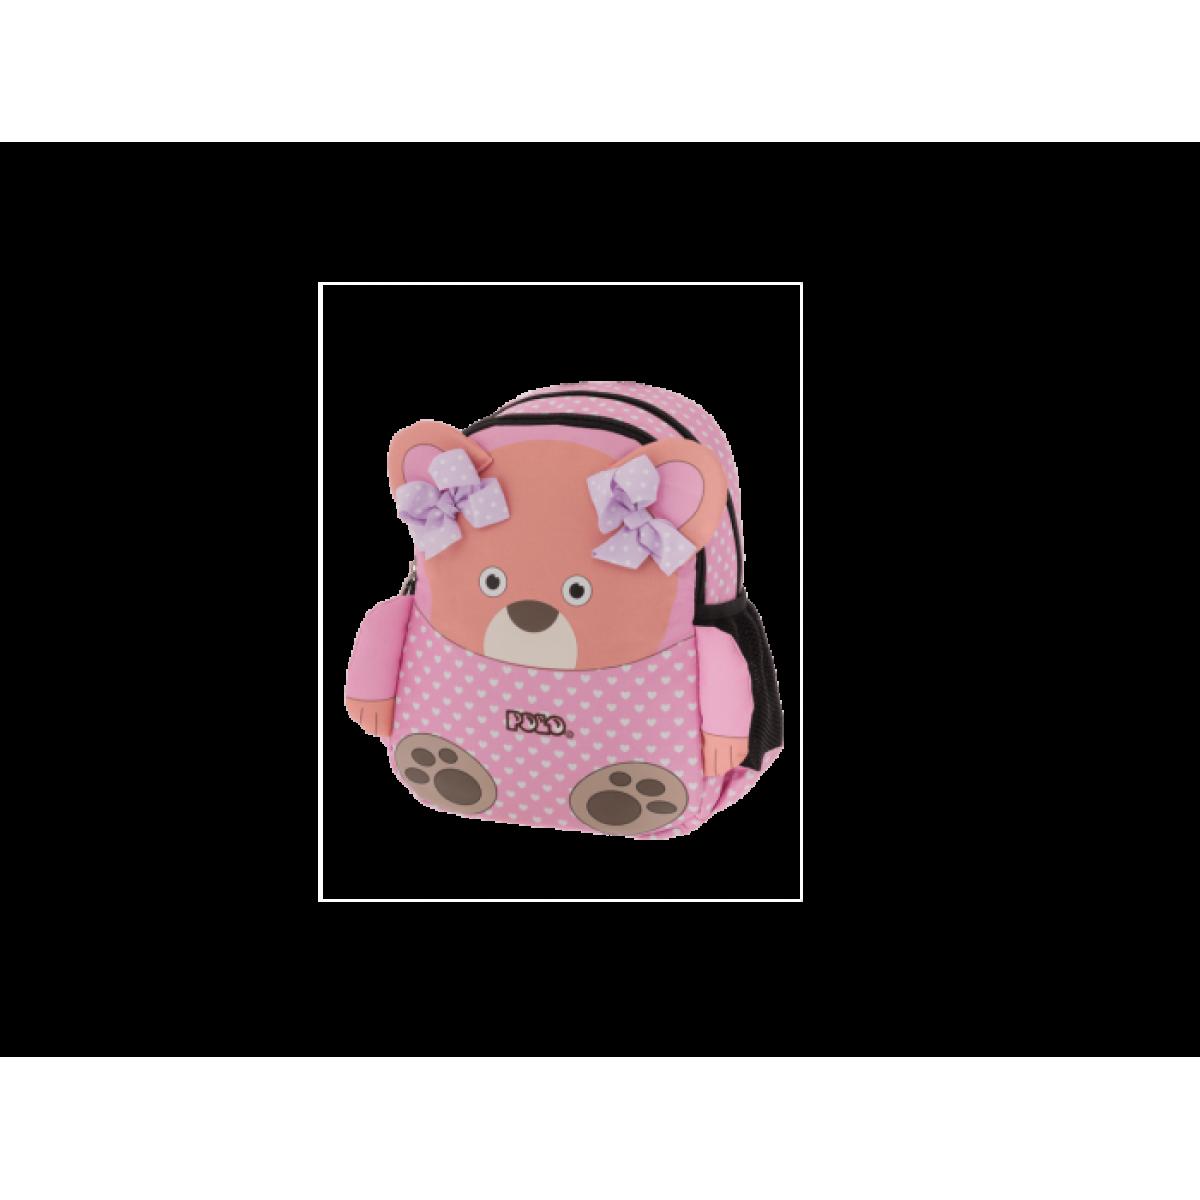 4dcacb5159 ANIMAL ΣΑΚΙΔΙΟ ΝΗΠΙΑΓΩΓΕΙΟΥ 9-01-014-74